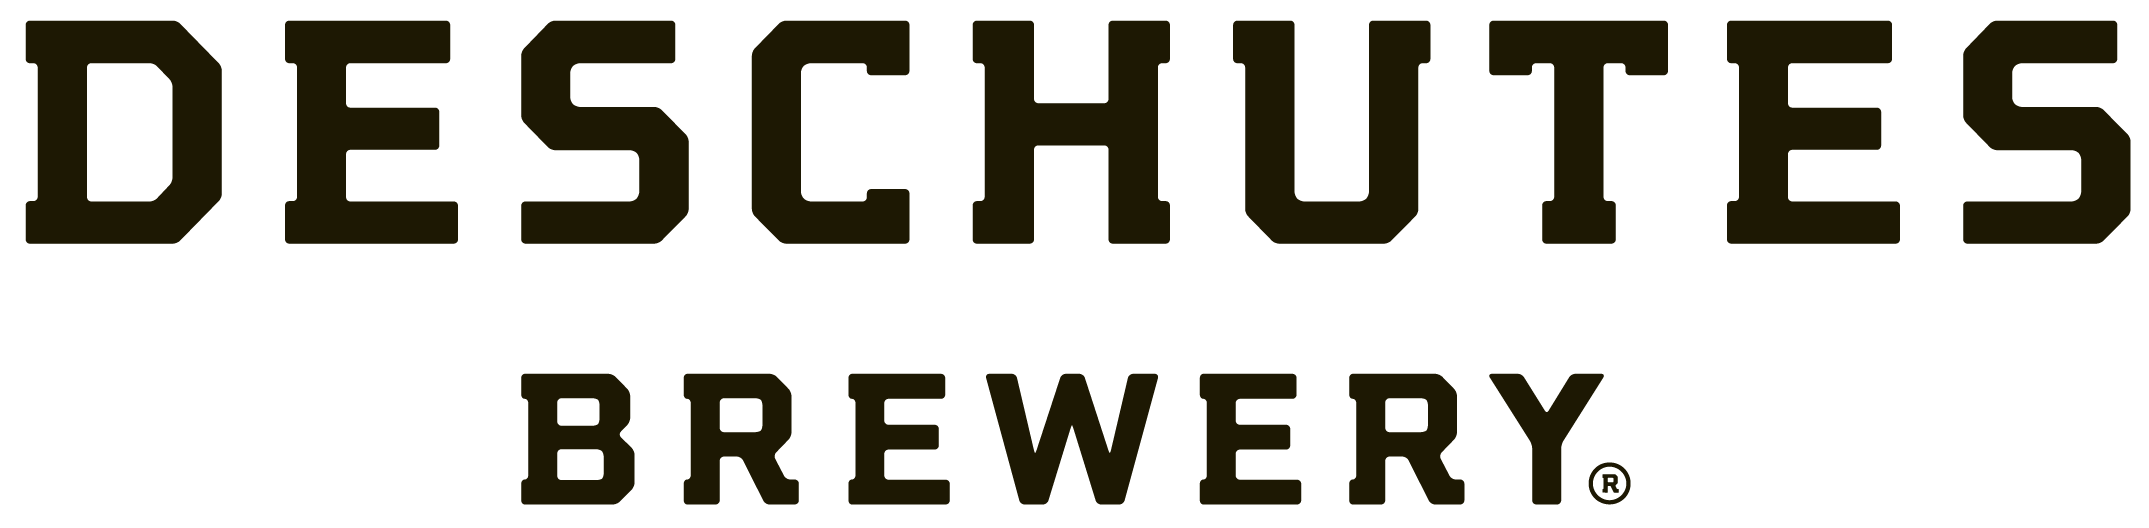 Deschutes Brewery-logo